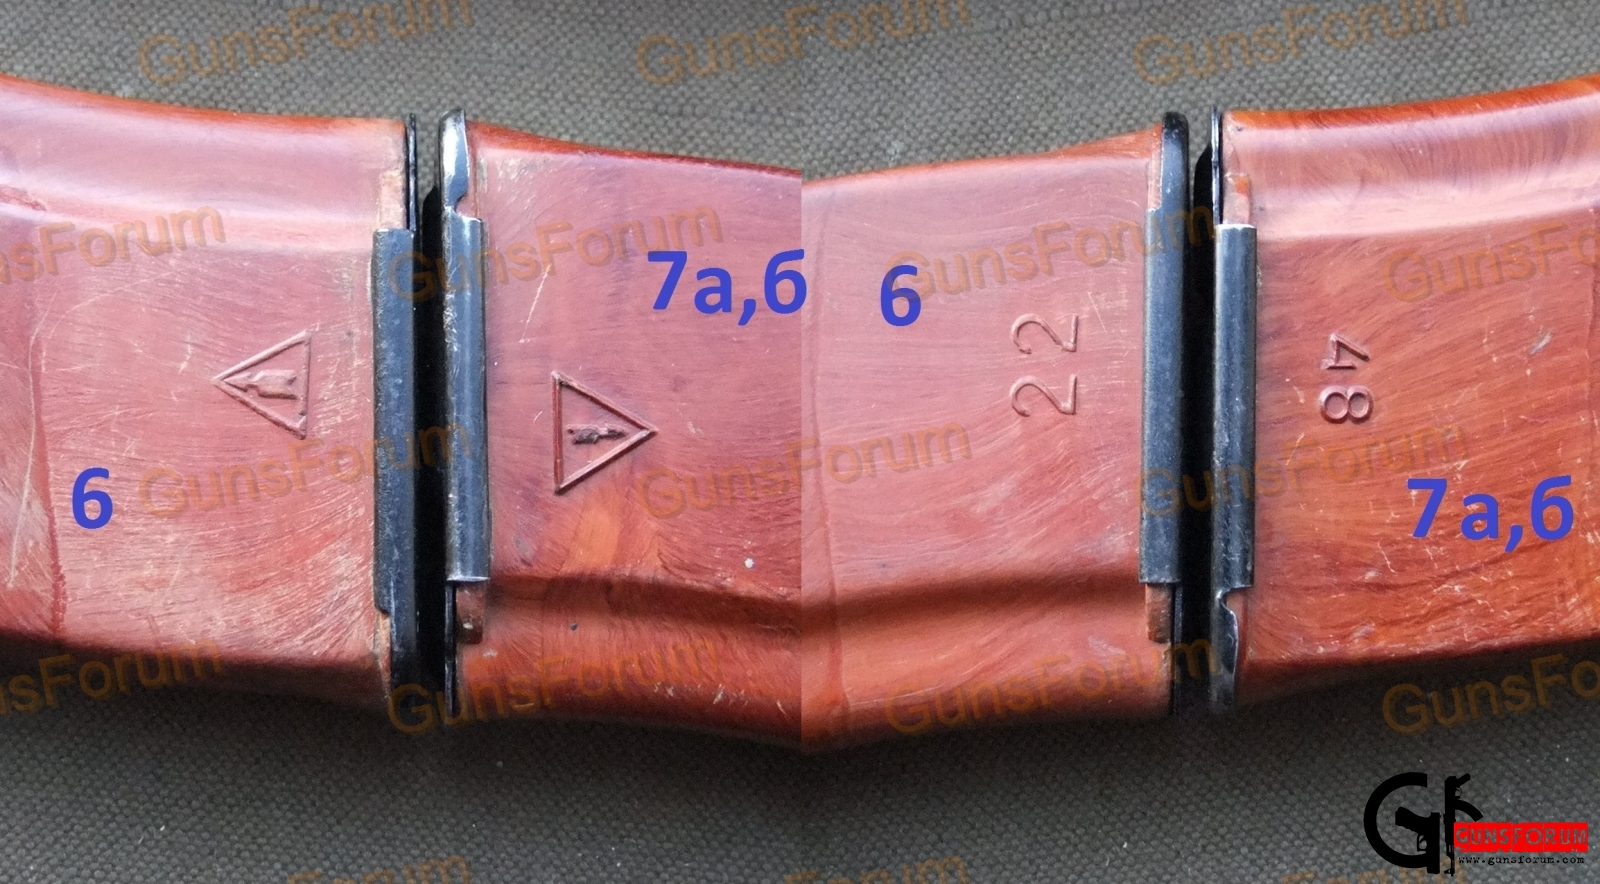 large_43.JPG.1be496d71e4762eafa5658d93f8c53b7.JPG